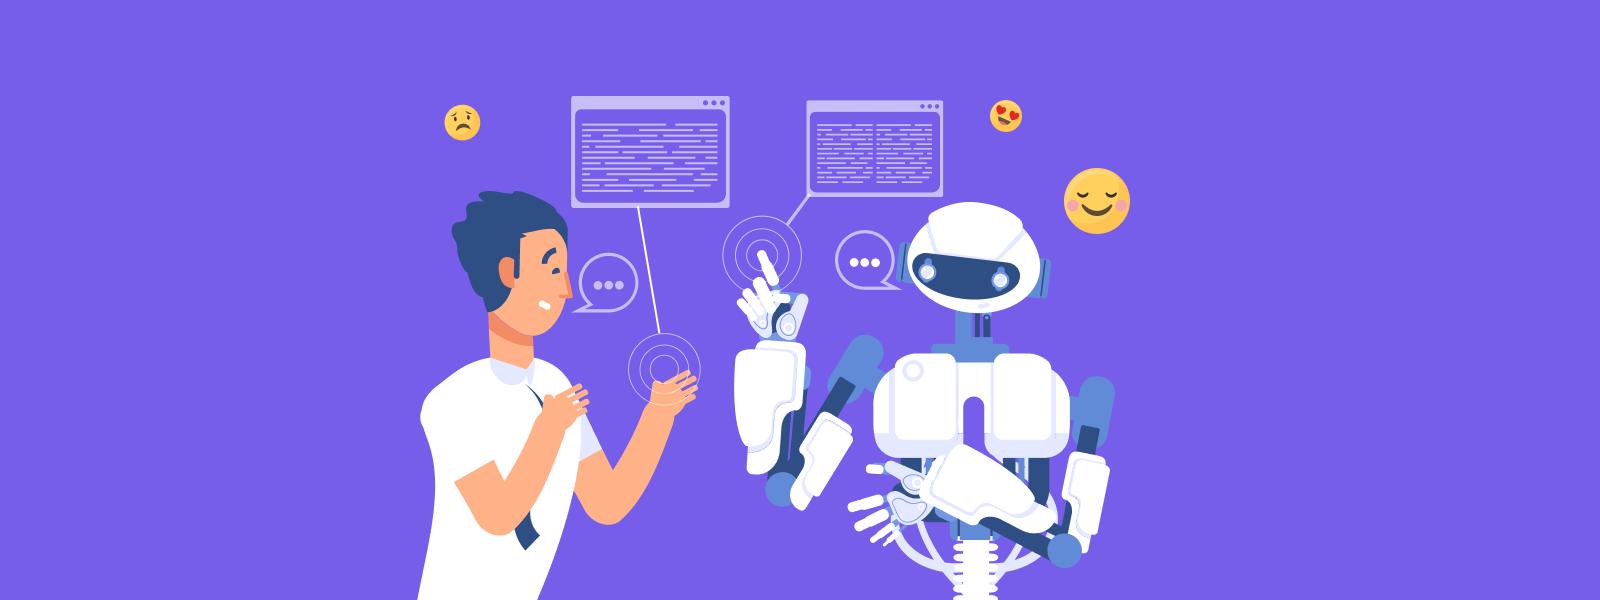 Chatbot sentiment analysis